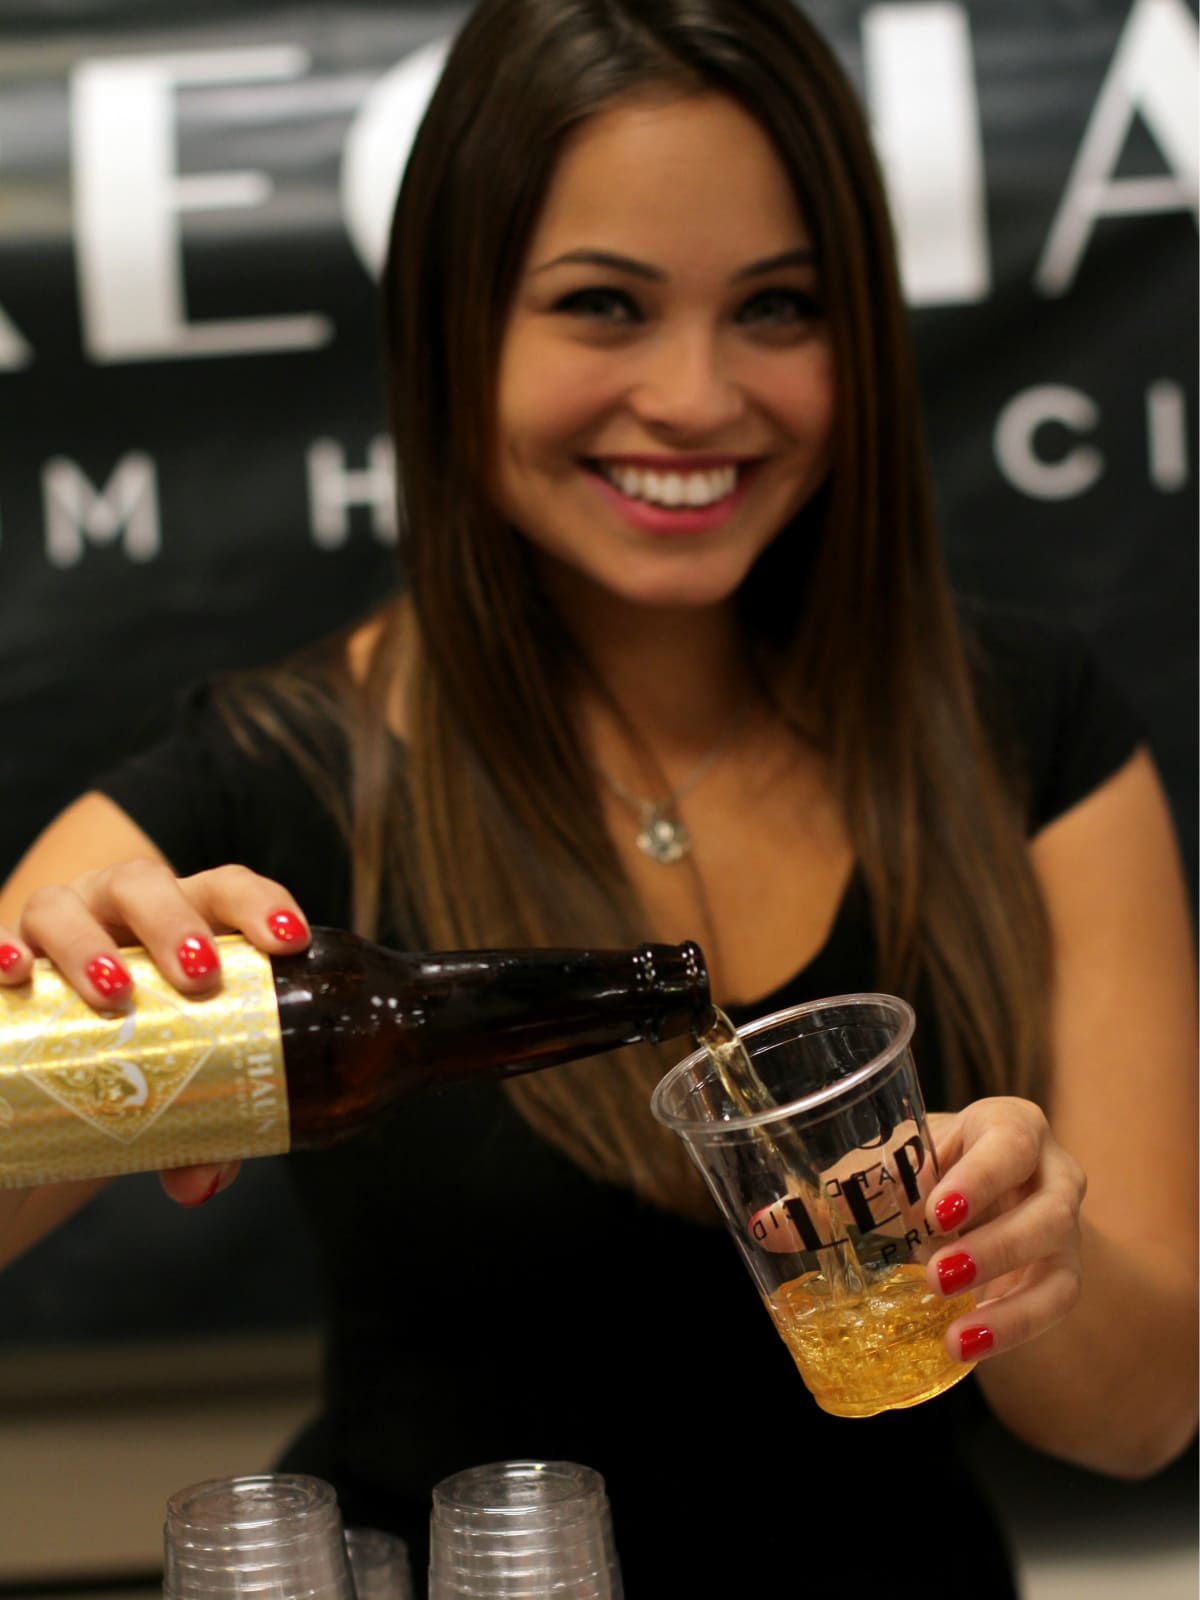 Leprechaun Cider girl